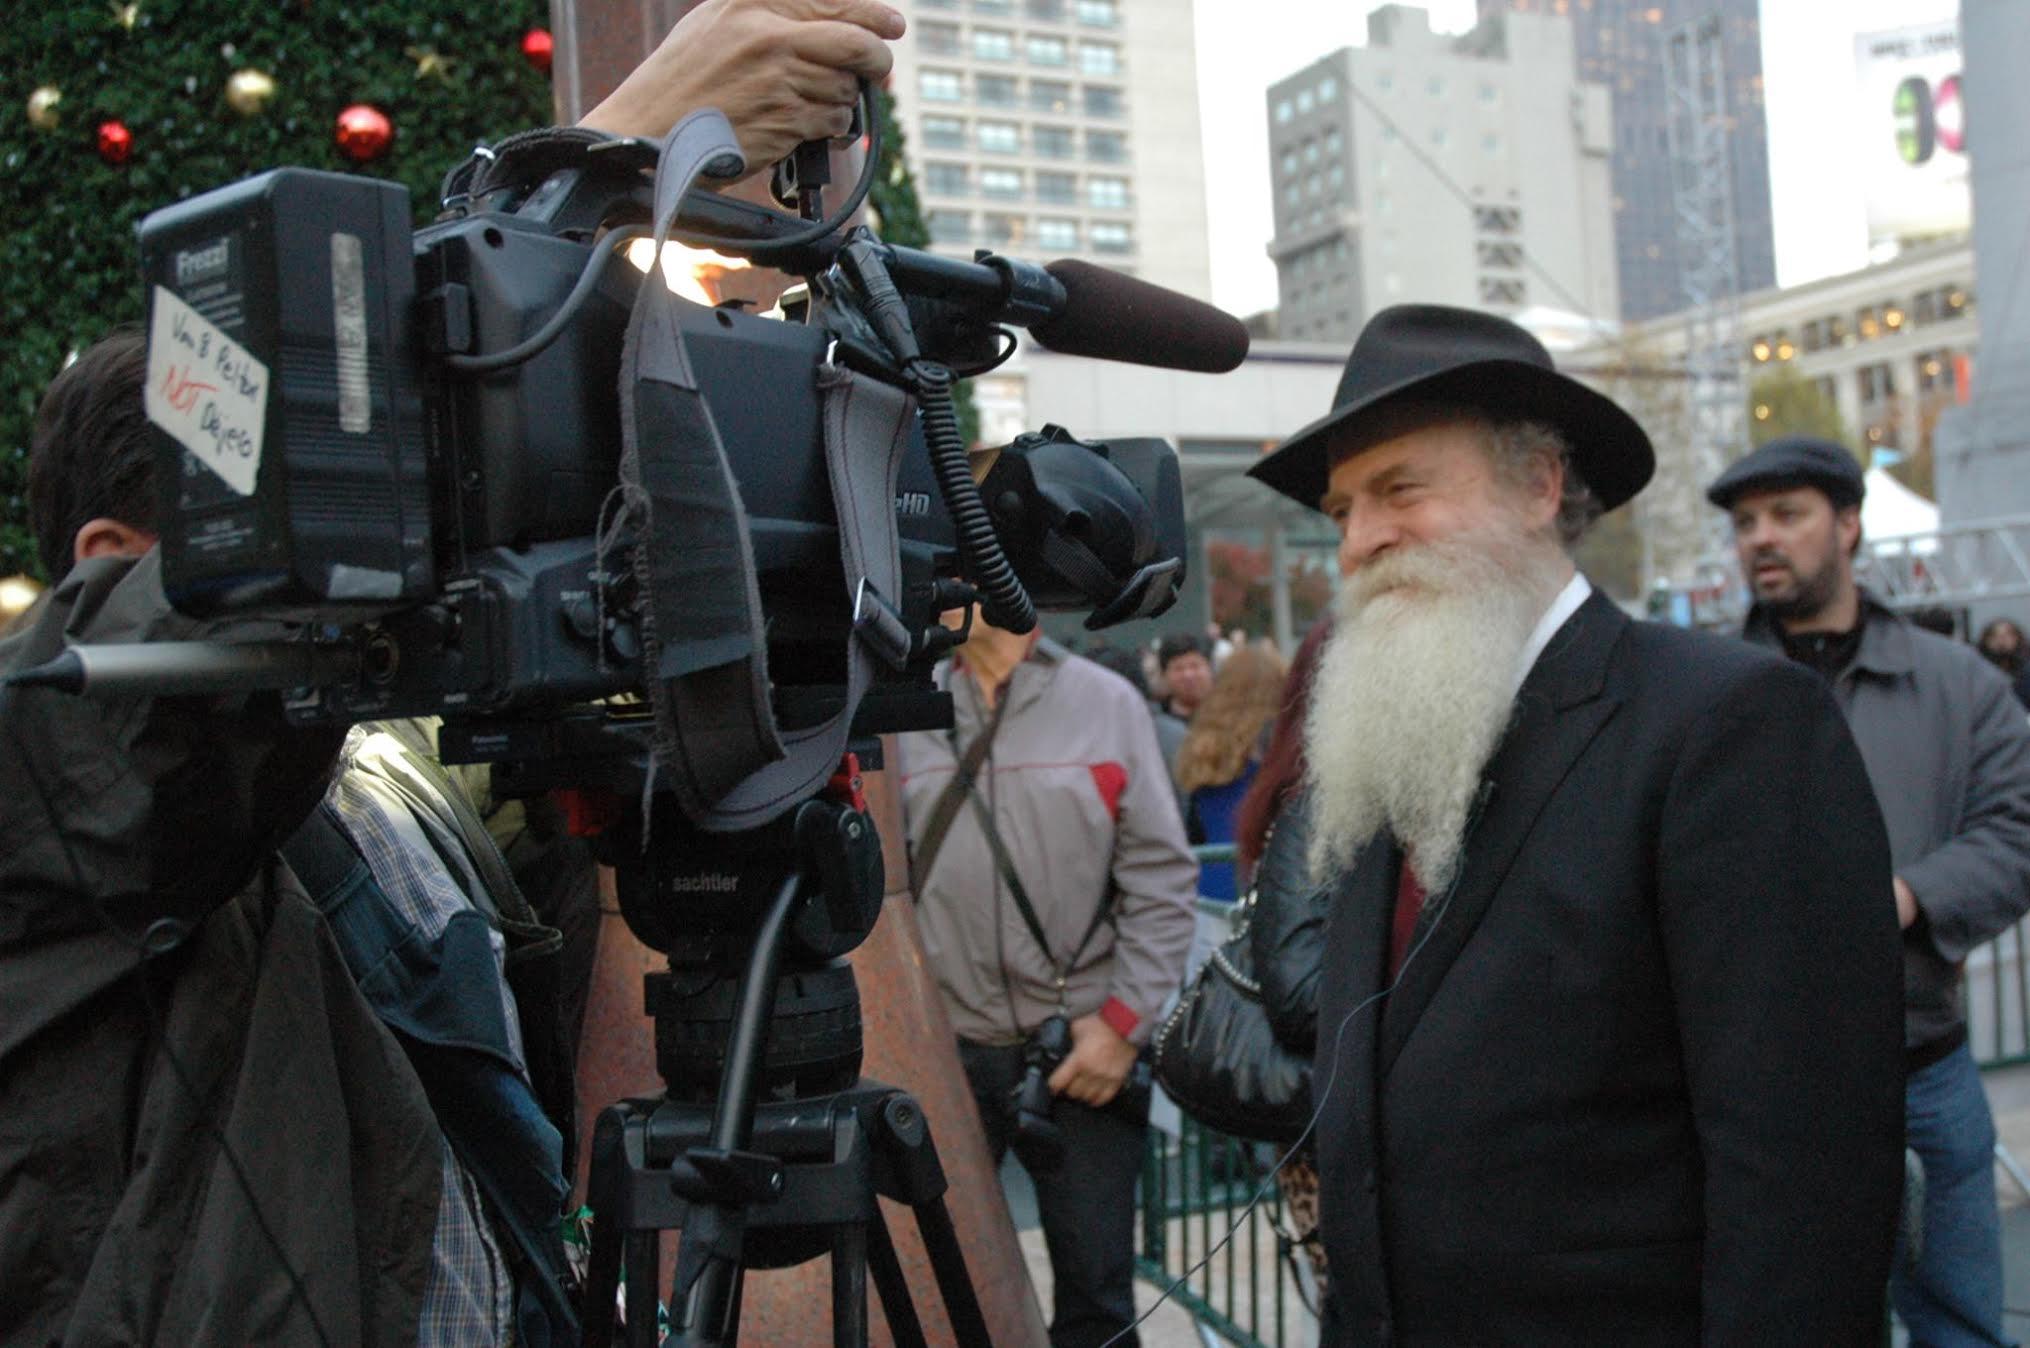 rabbi_earth_Press_TV.jpg